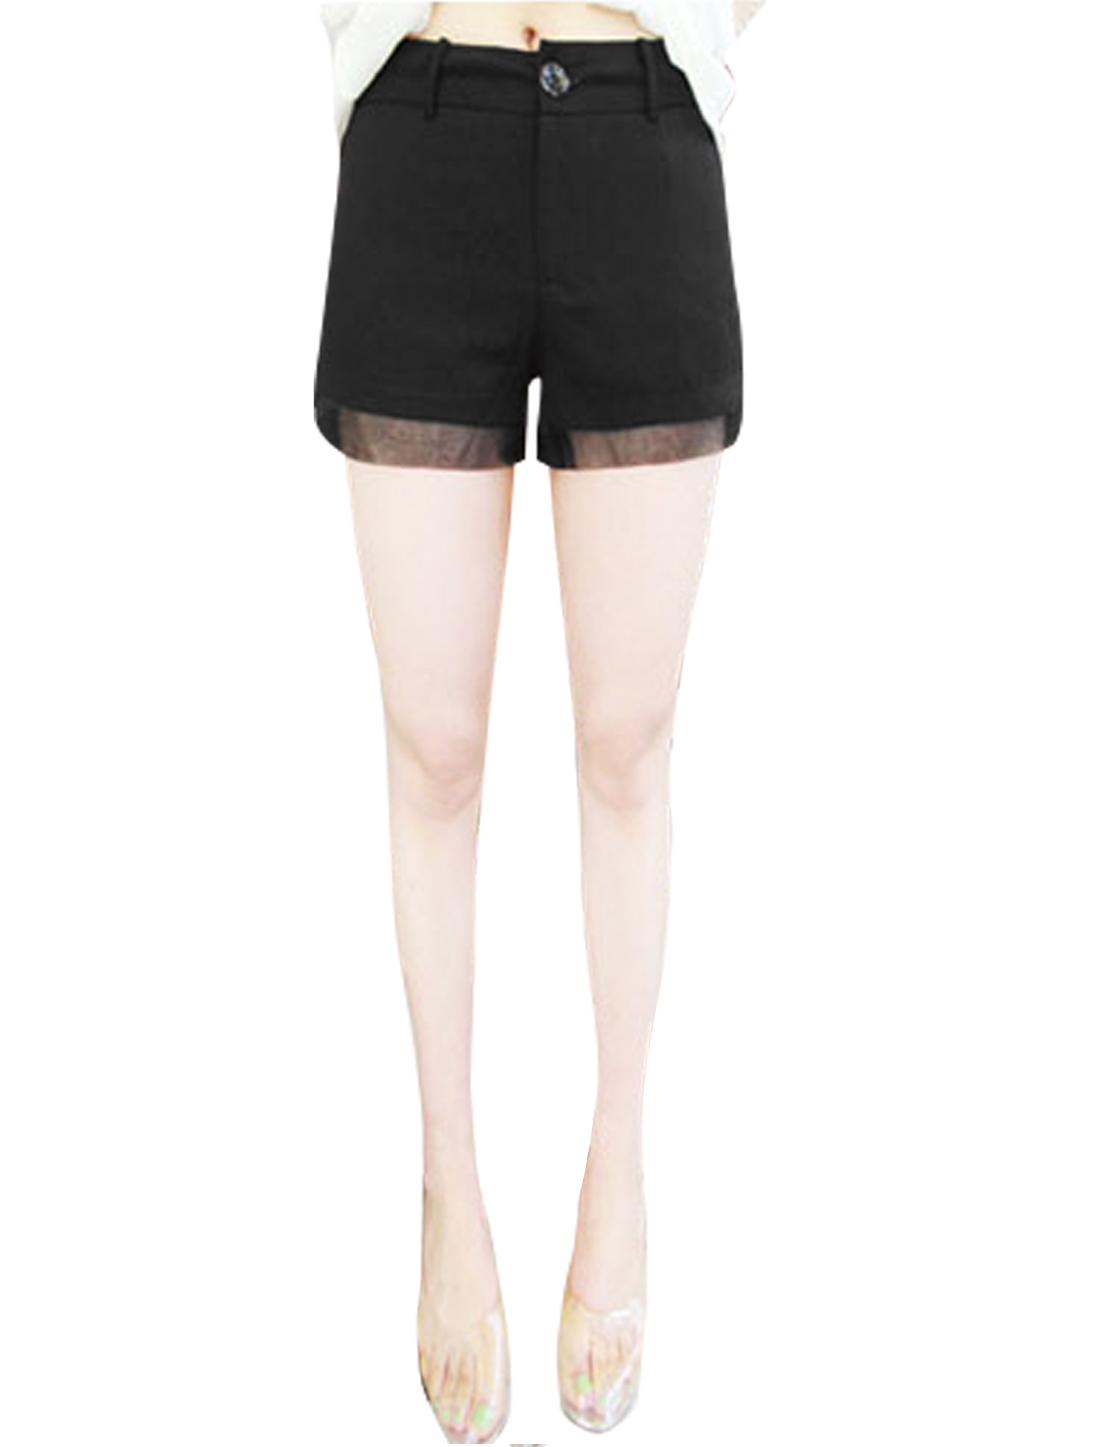 Ladies Pockets Mesh Panel Zip Fly High Waist Shorts Black XS